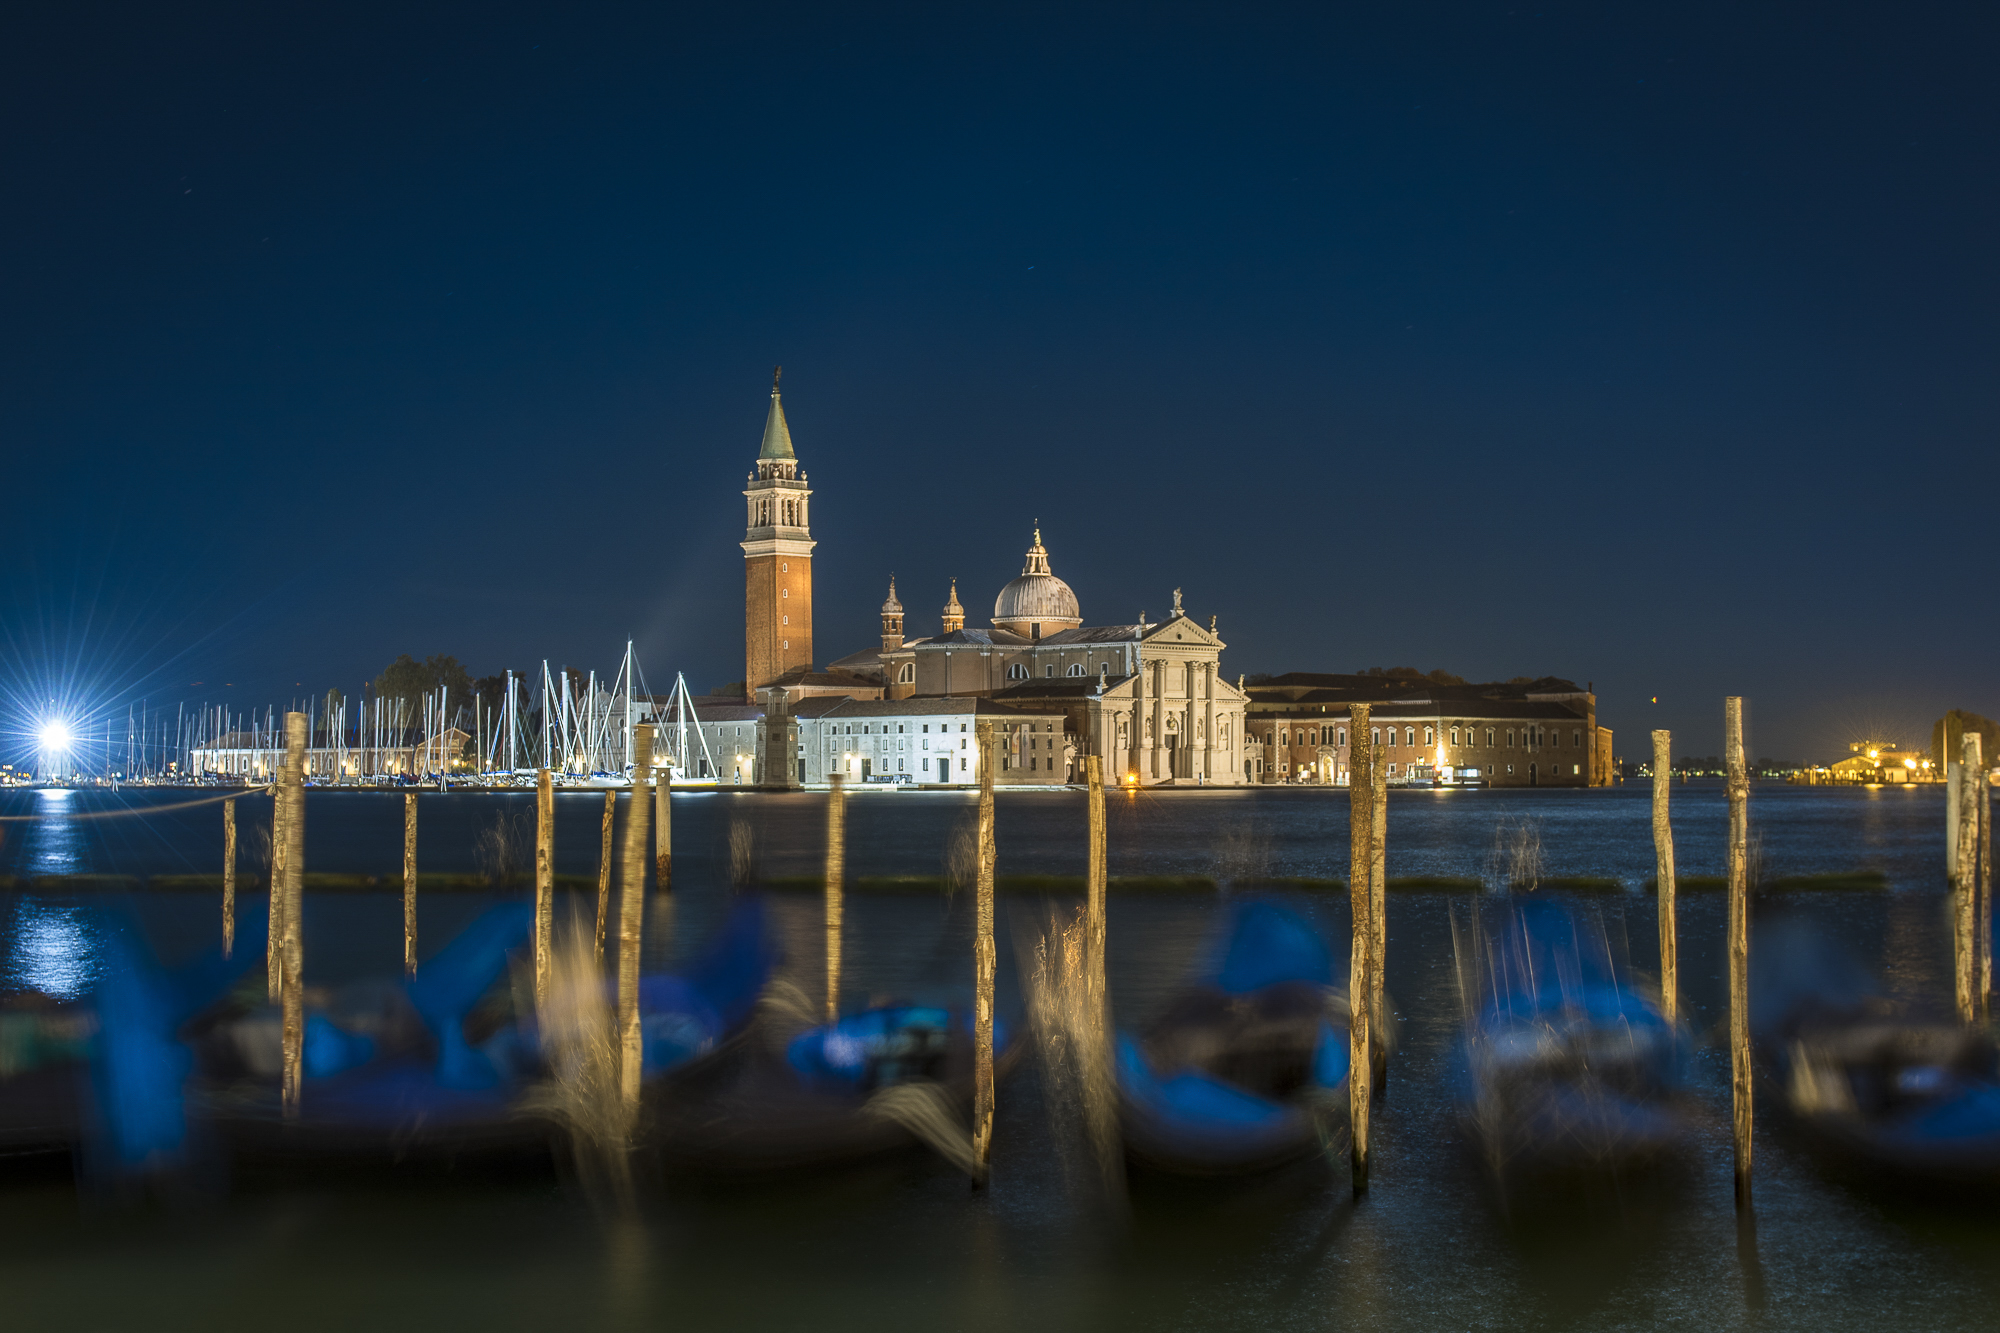 Isola de San Giorgio Maggiore from Venice  PHOTOGRAPHY: ALEXANDER J.E. BRADLEY • NIKON D500 • AF-S NIKKOR 24-70MM Ƒ/2.8G ED @ 32MM • Ƒ/5.6 • 30 SEC • ISO 100